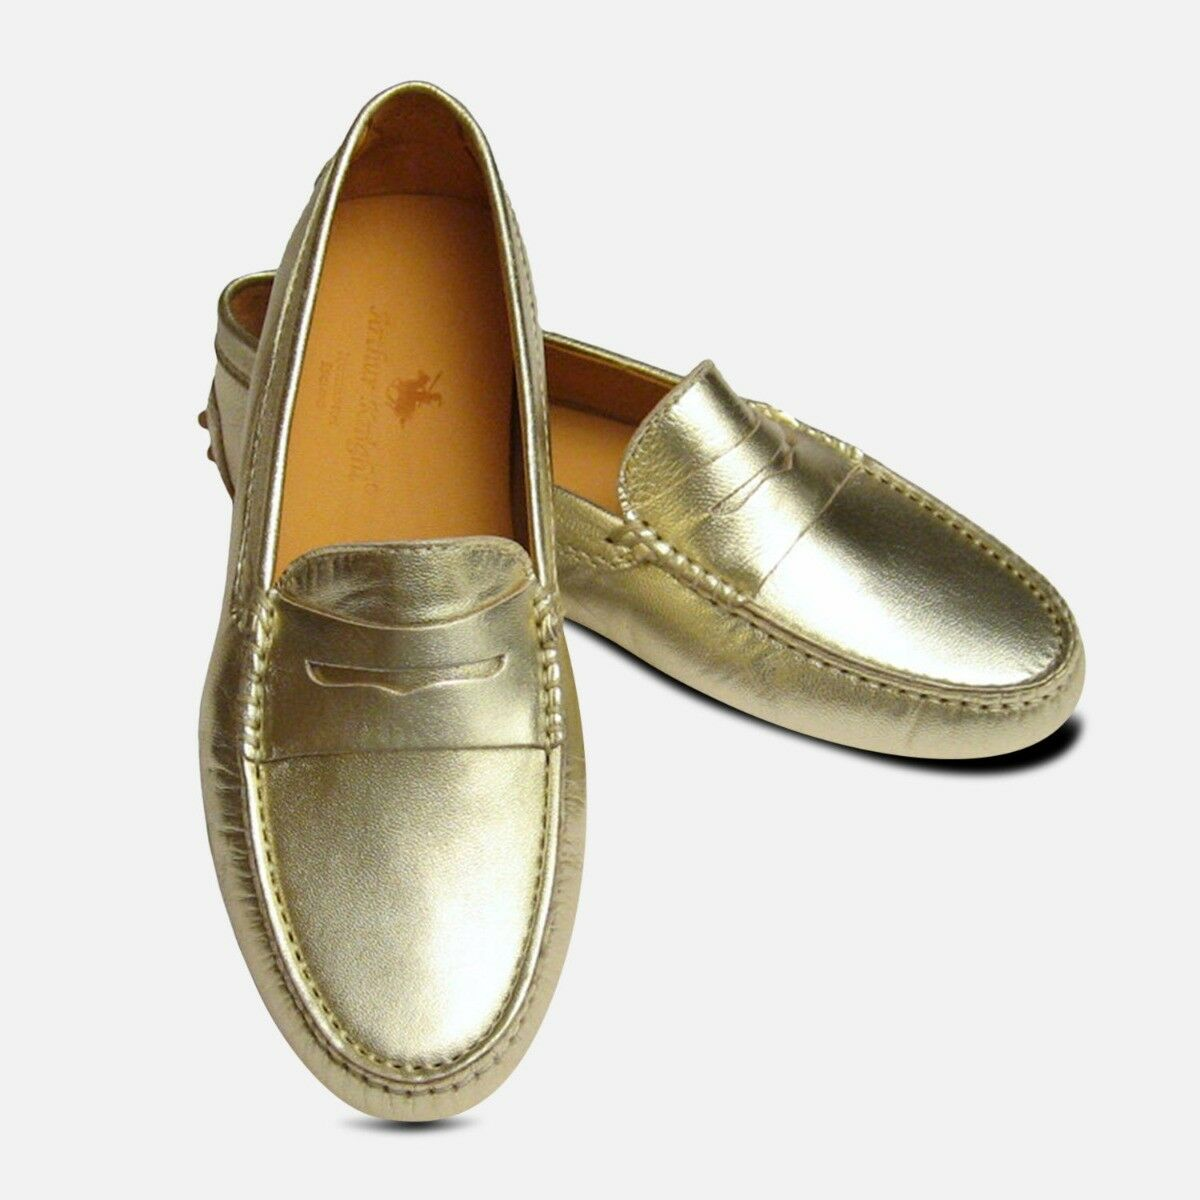 Or Métallique Cuir Arthur chevalier Femme Driving chaussures